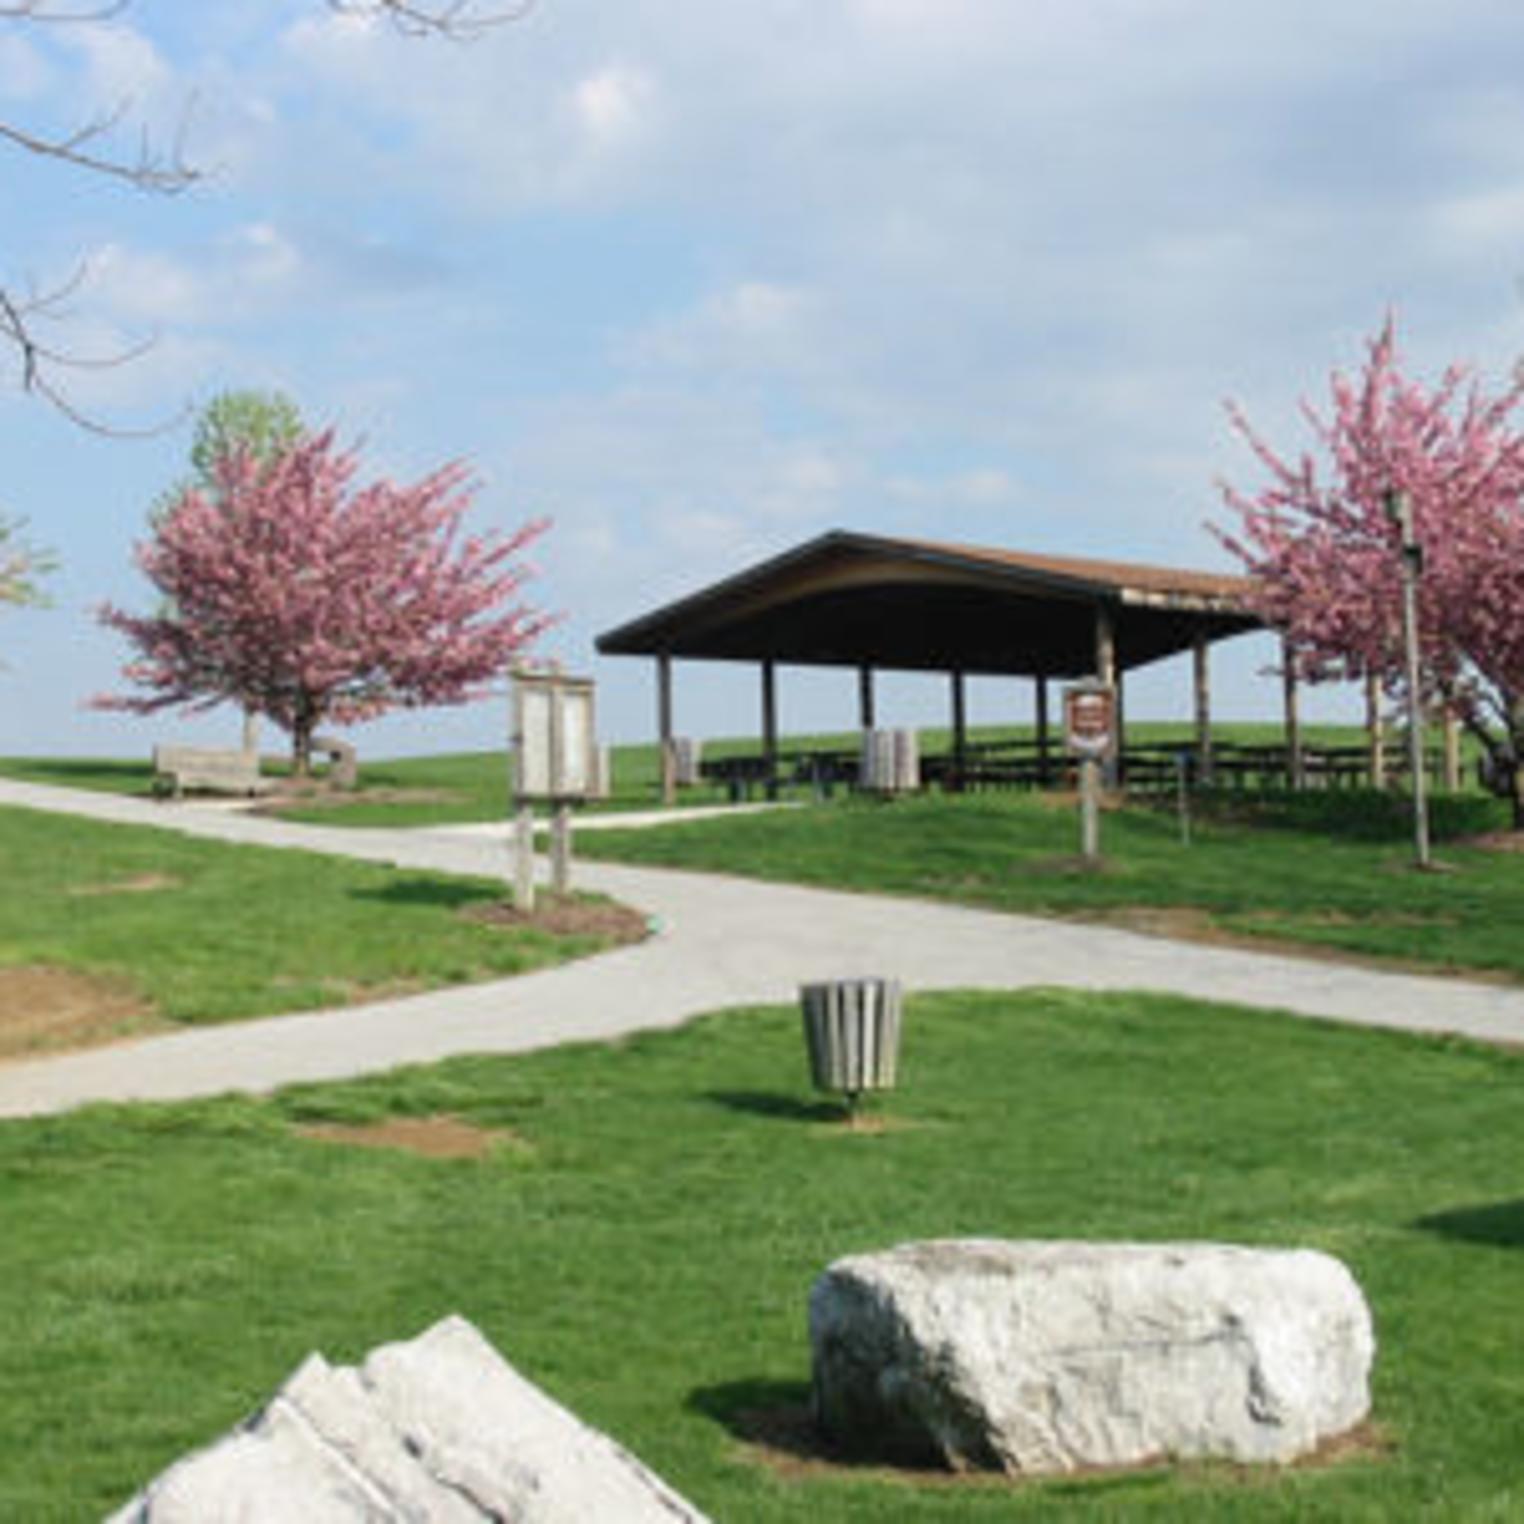 Pavilion at Adams-Ricci Community Park